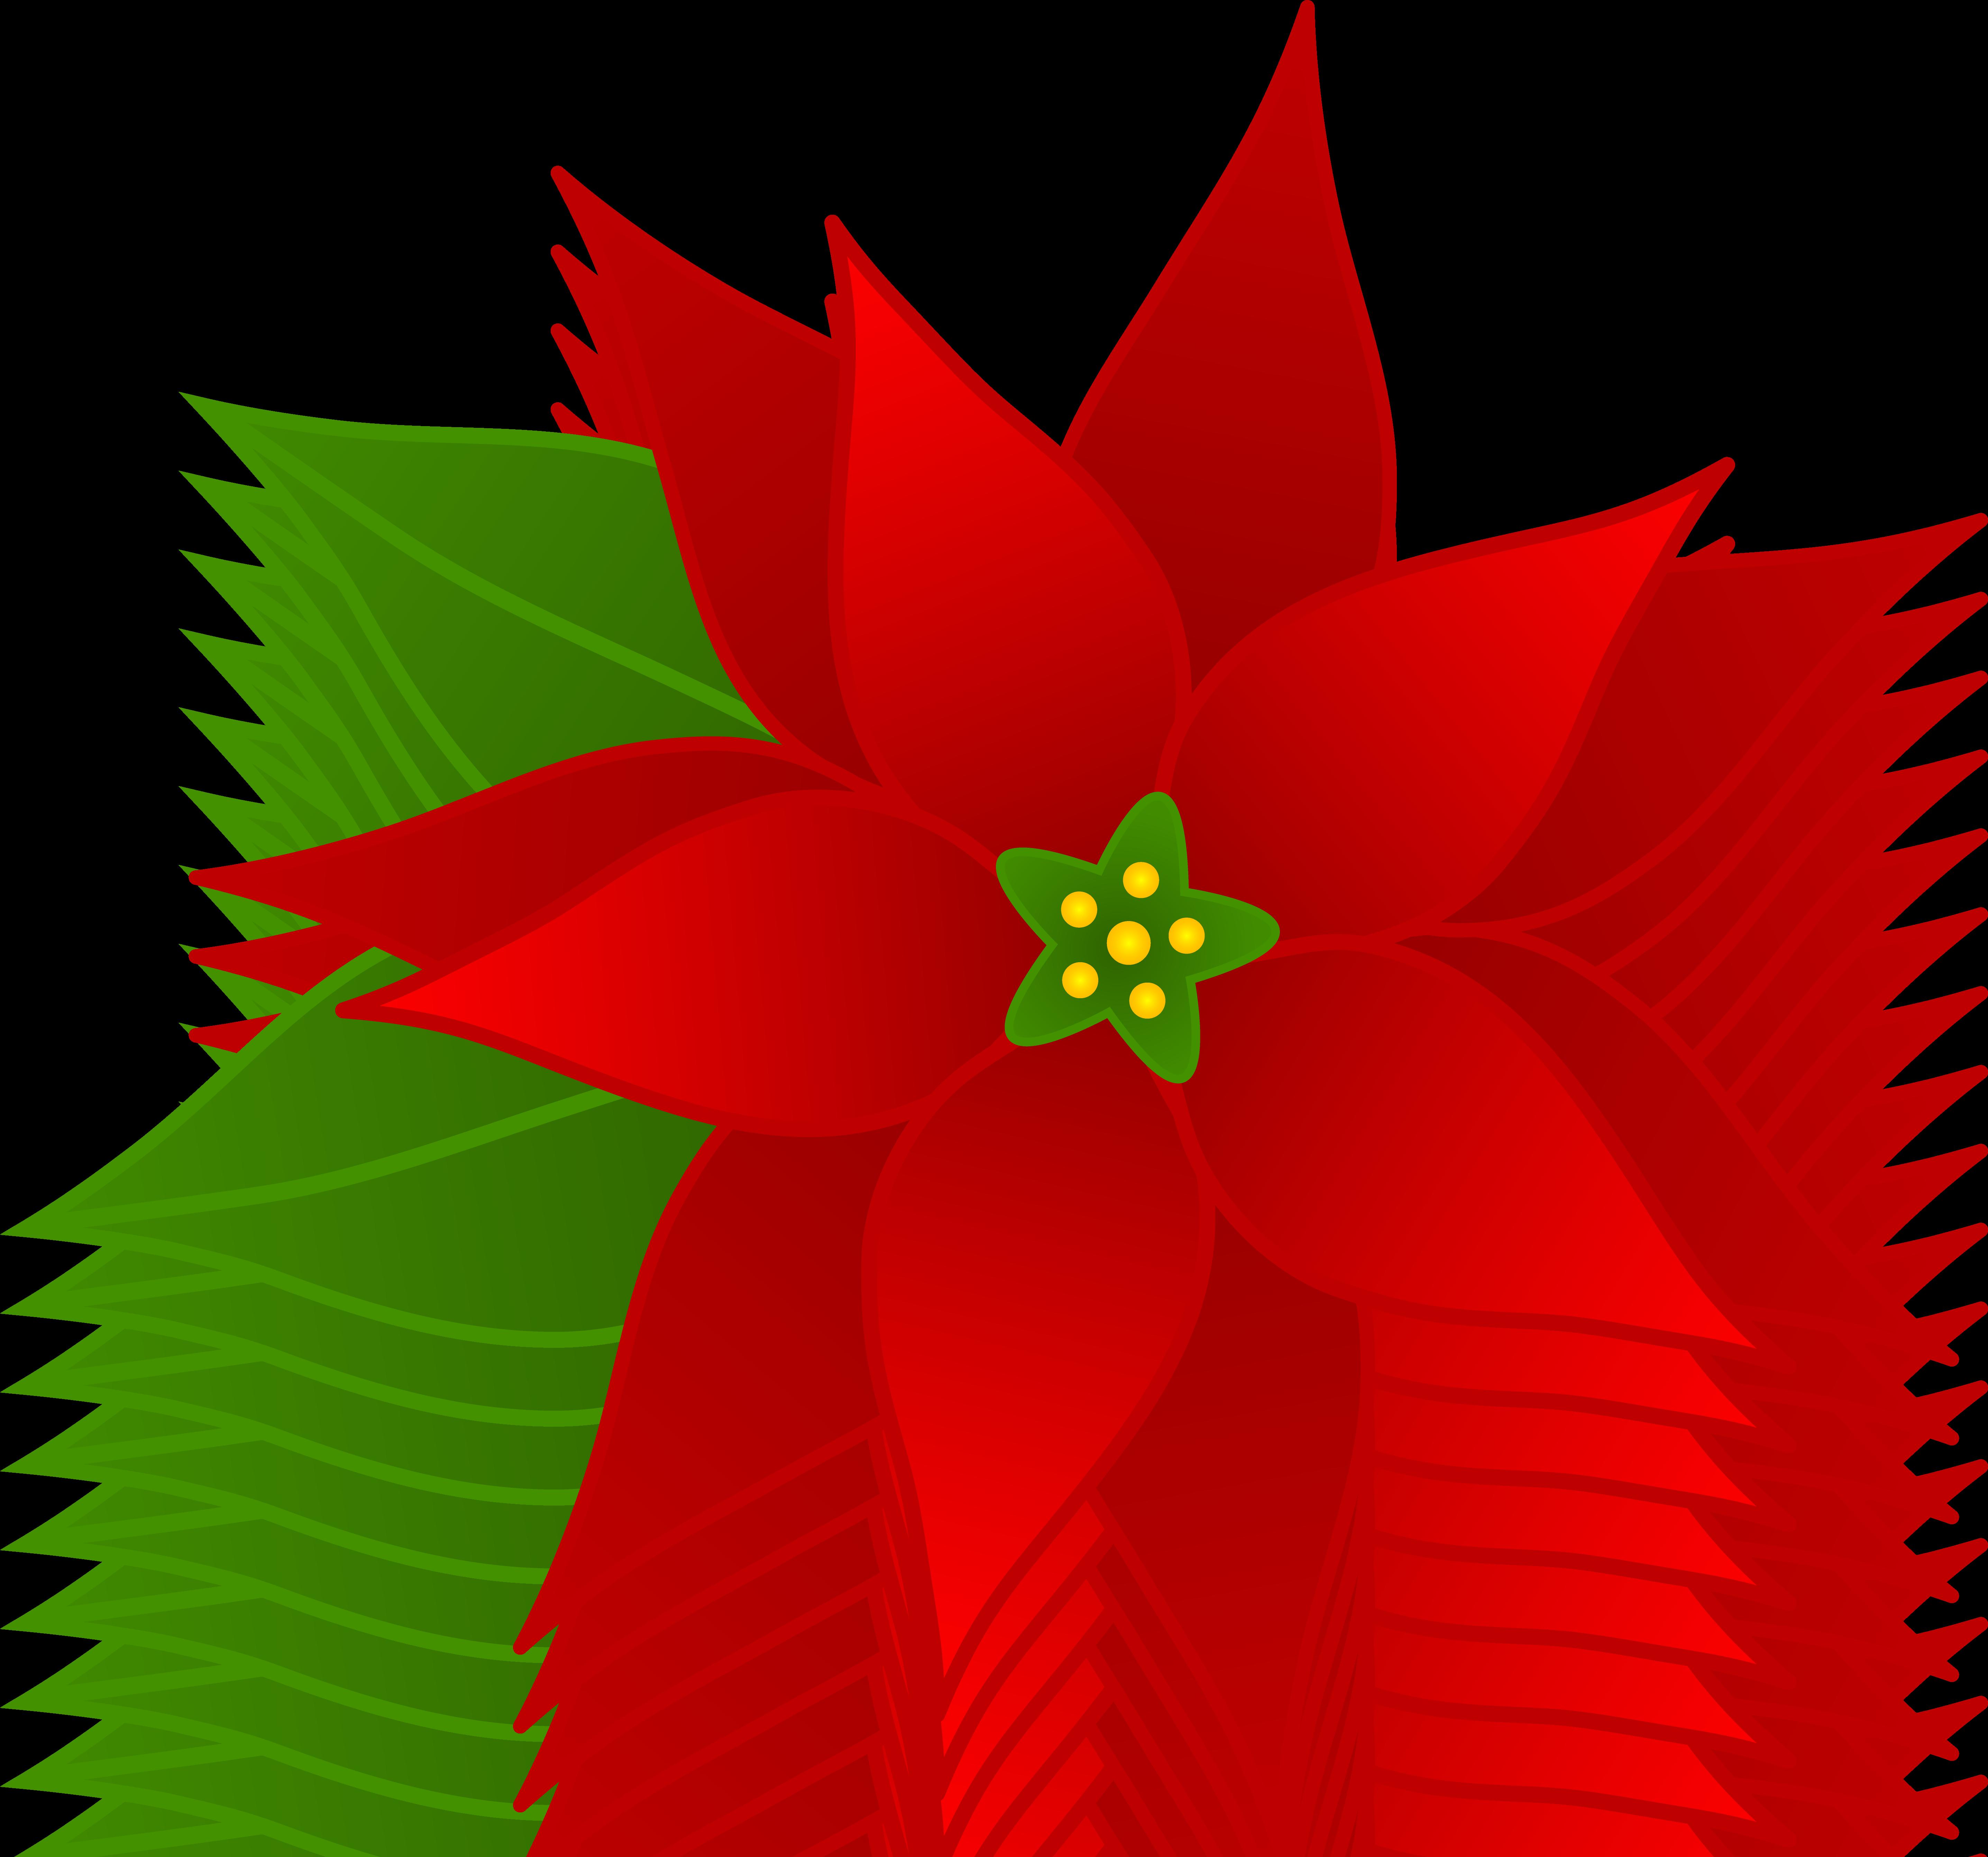 Transparent Flower Clipart | Free download best Transparent Flower ... for Transparent Png Images Roses  303mzq